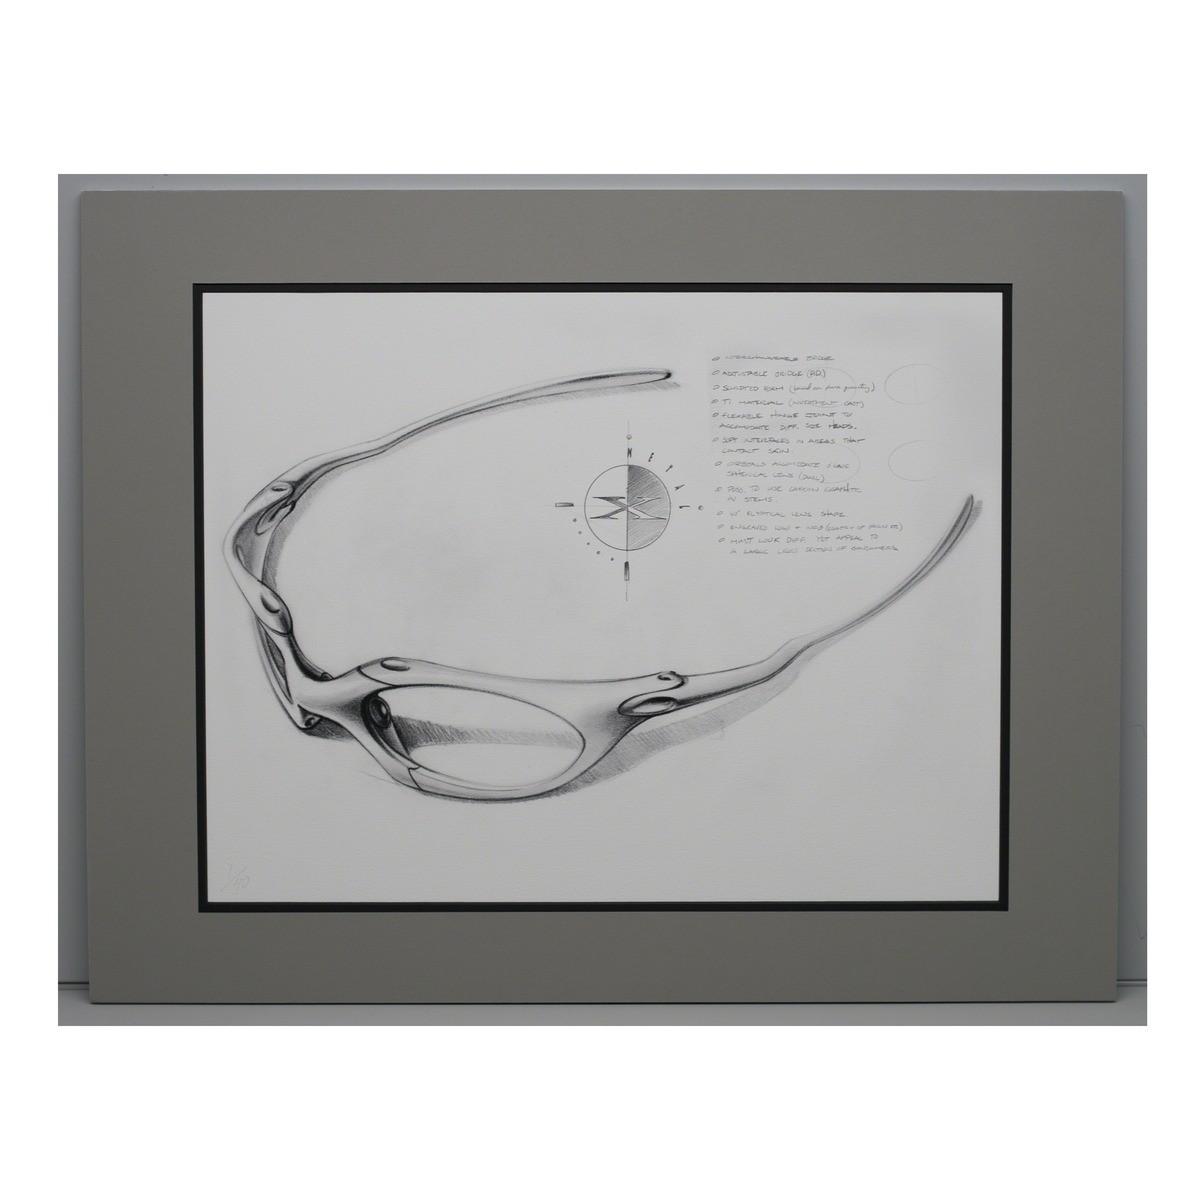 Oakley Metal Sketch Help - 26856670359_23bdbda766_o.jpg